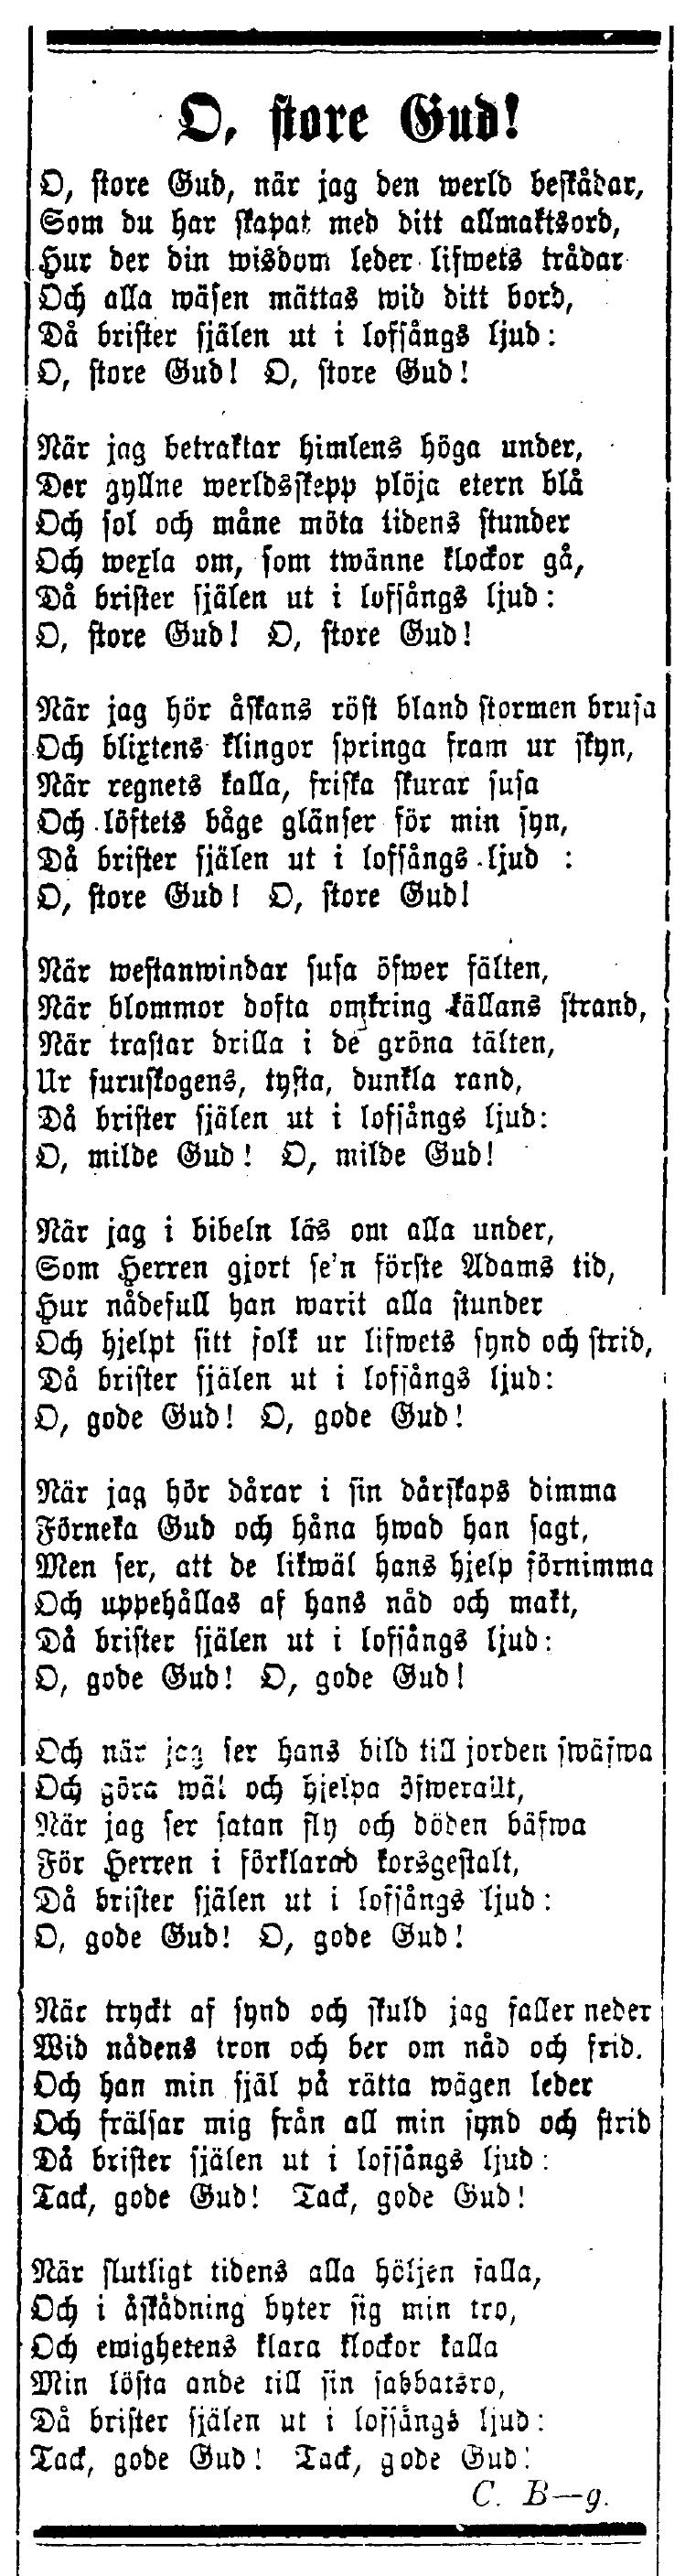 Fig. 1.   Mönsterås Tidningen , front page, 13 Mar. 1886.